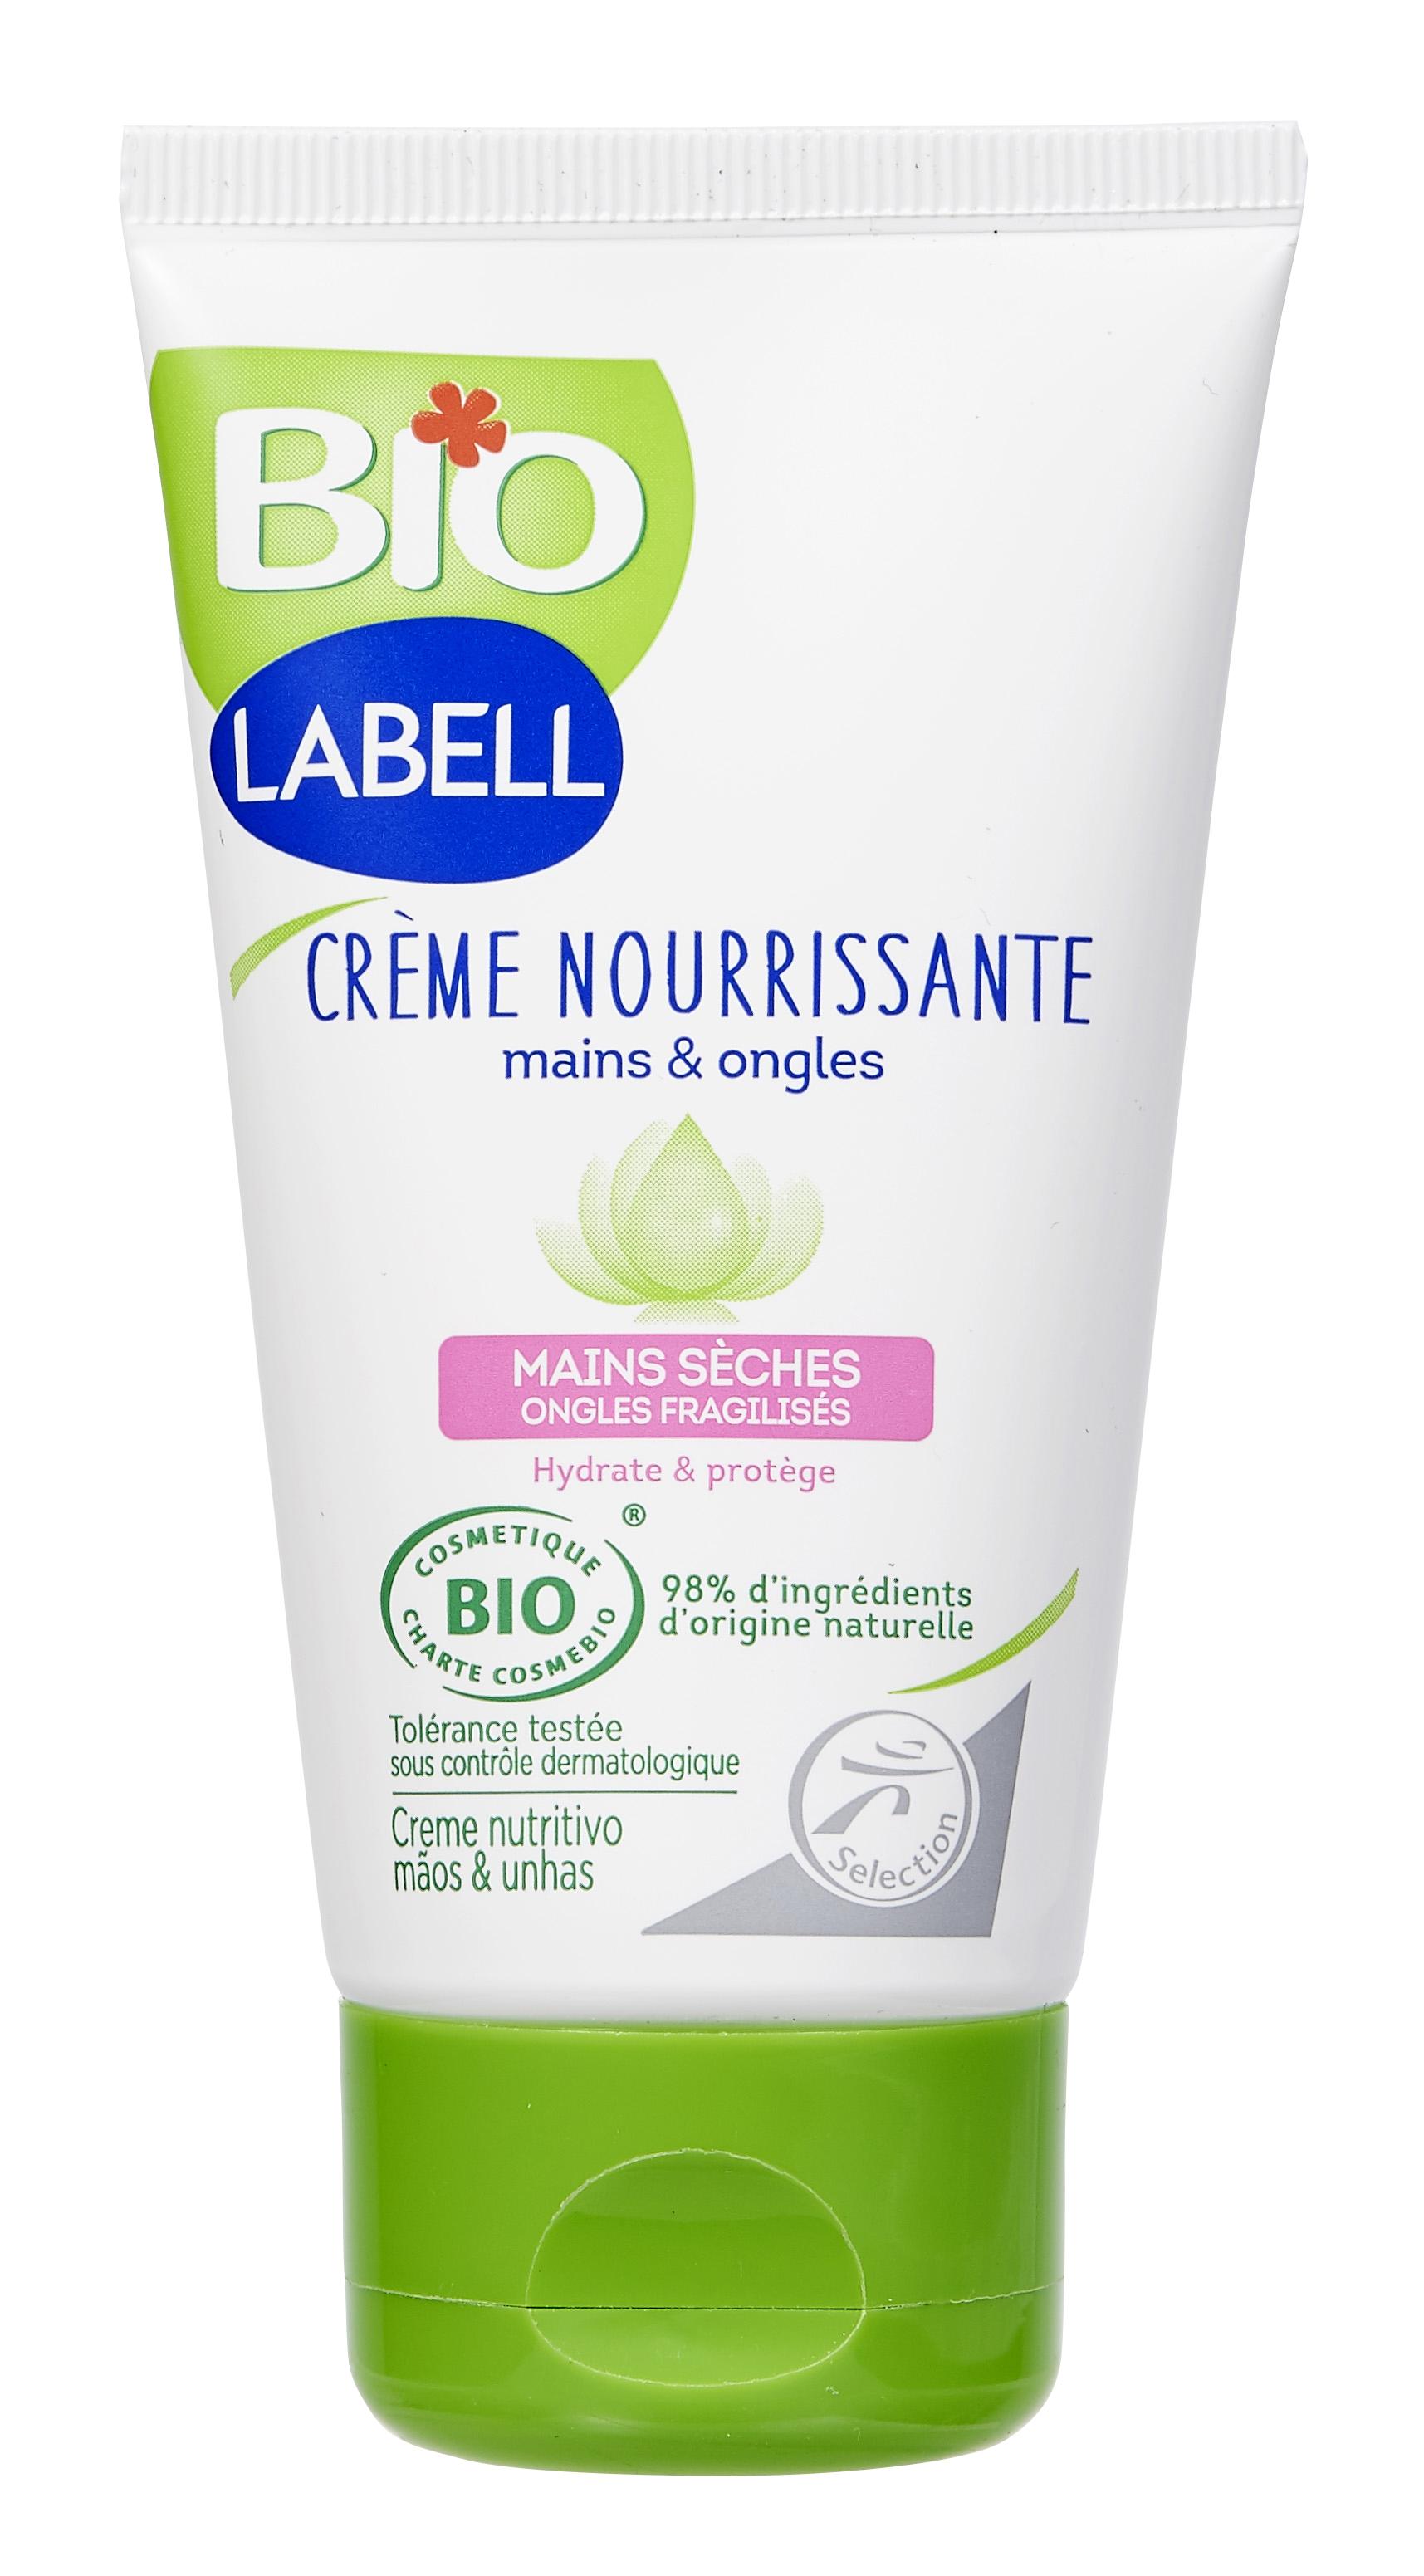 creme-nourissante-main-et-ongles-bio-labell